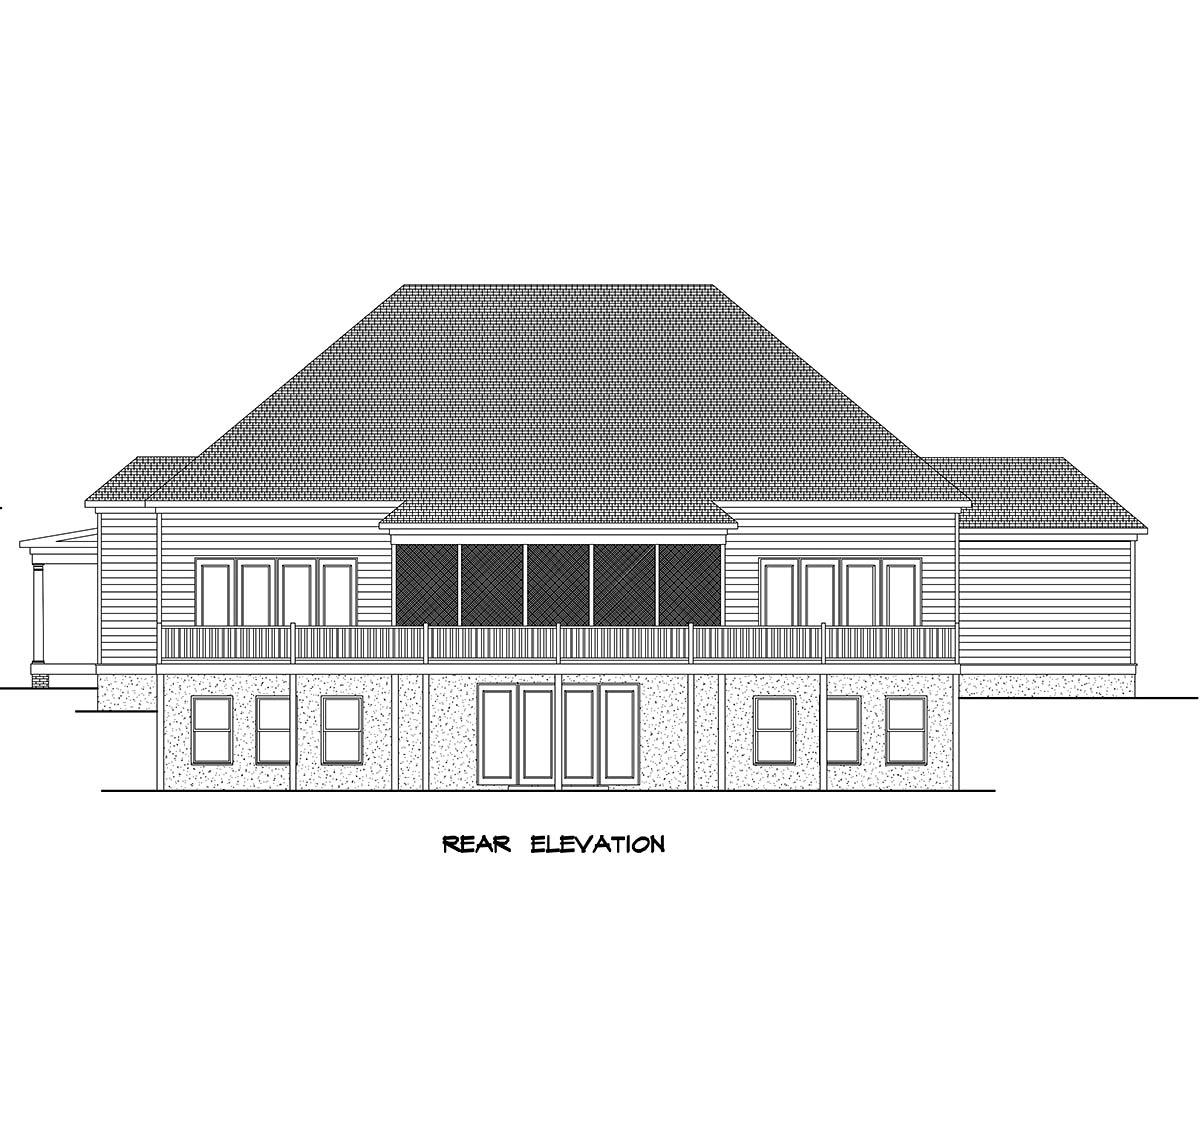 Farmhouse House Plan 60076 with 4 Beds, 4 Baths, 3 Car Garage Rear Elevation